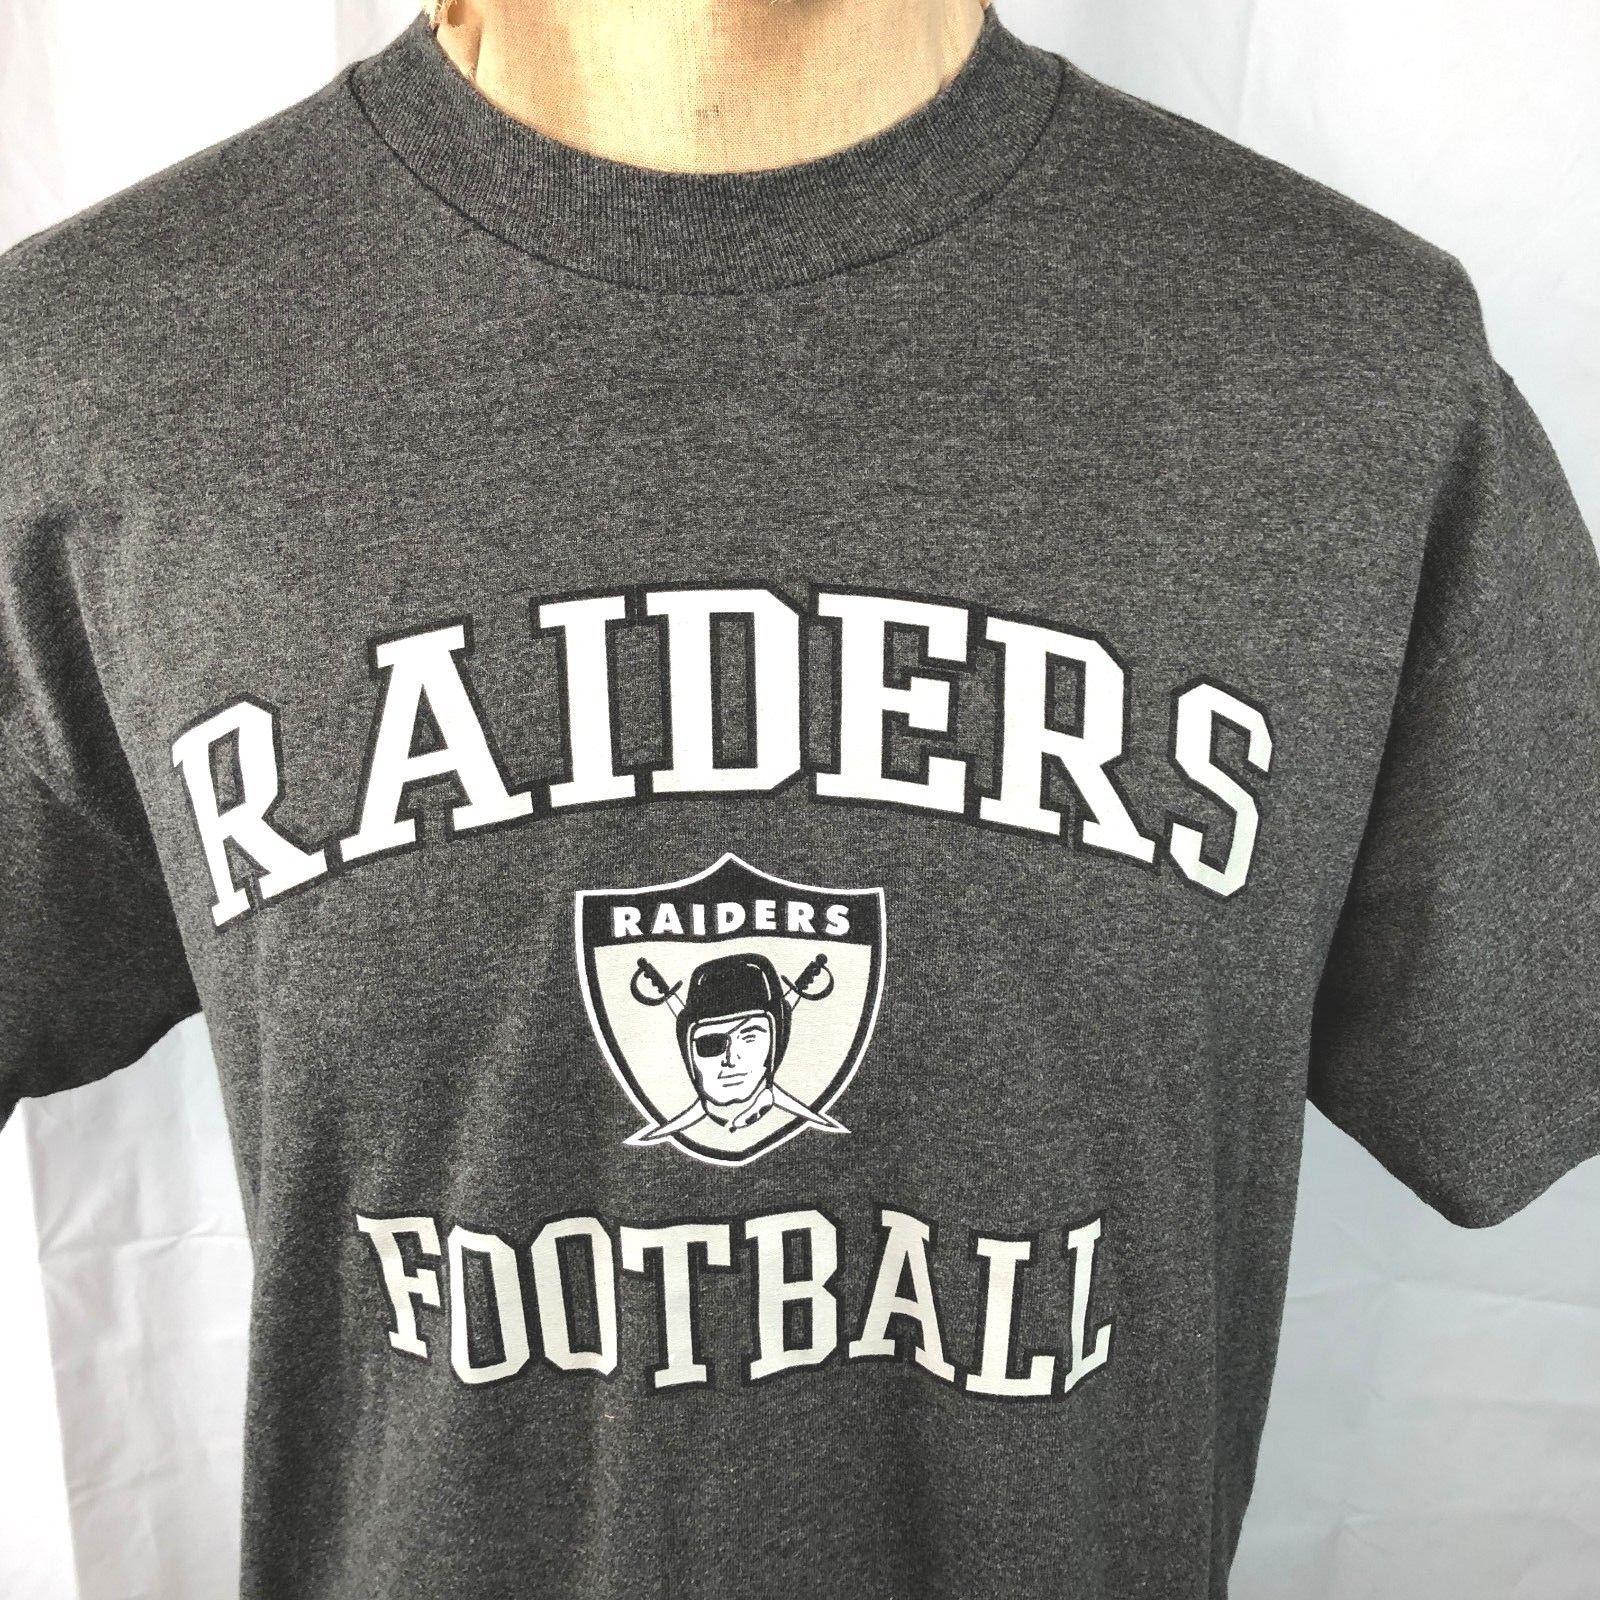 Raiders Football NFL Team Apparel L T-Shirt Large Mens Oakland or Los Angeles